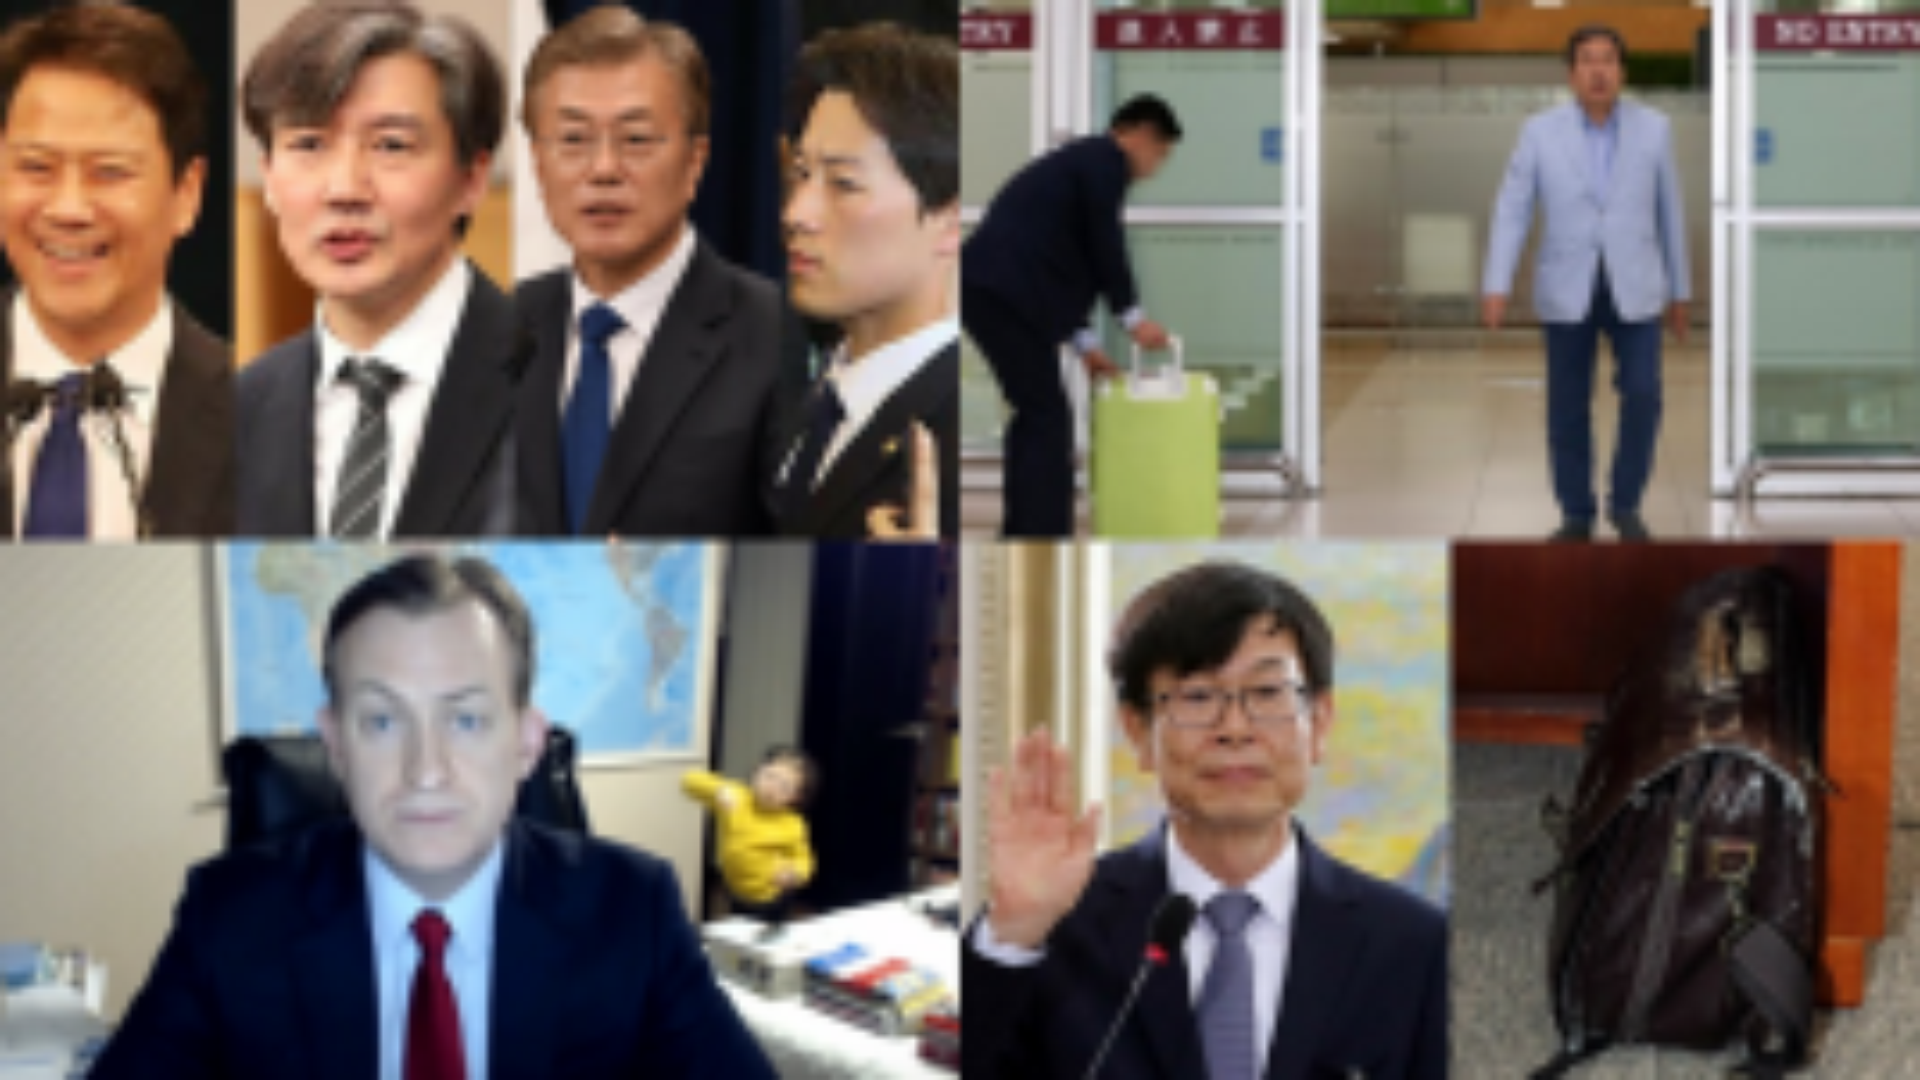 south korea meme 2017 feature - final